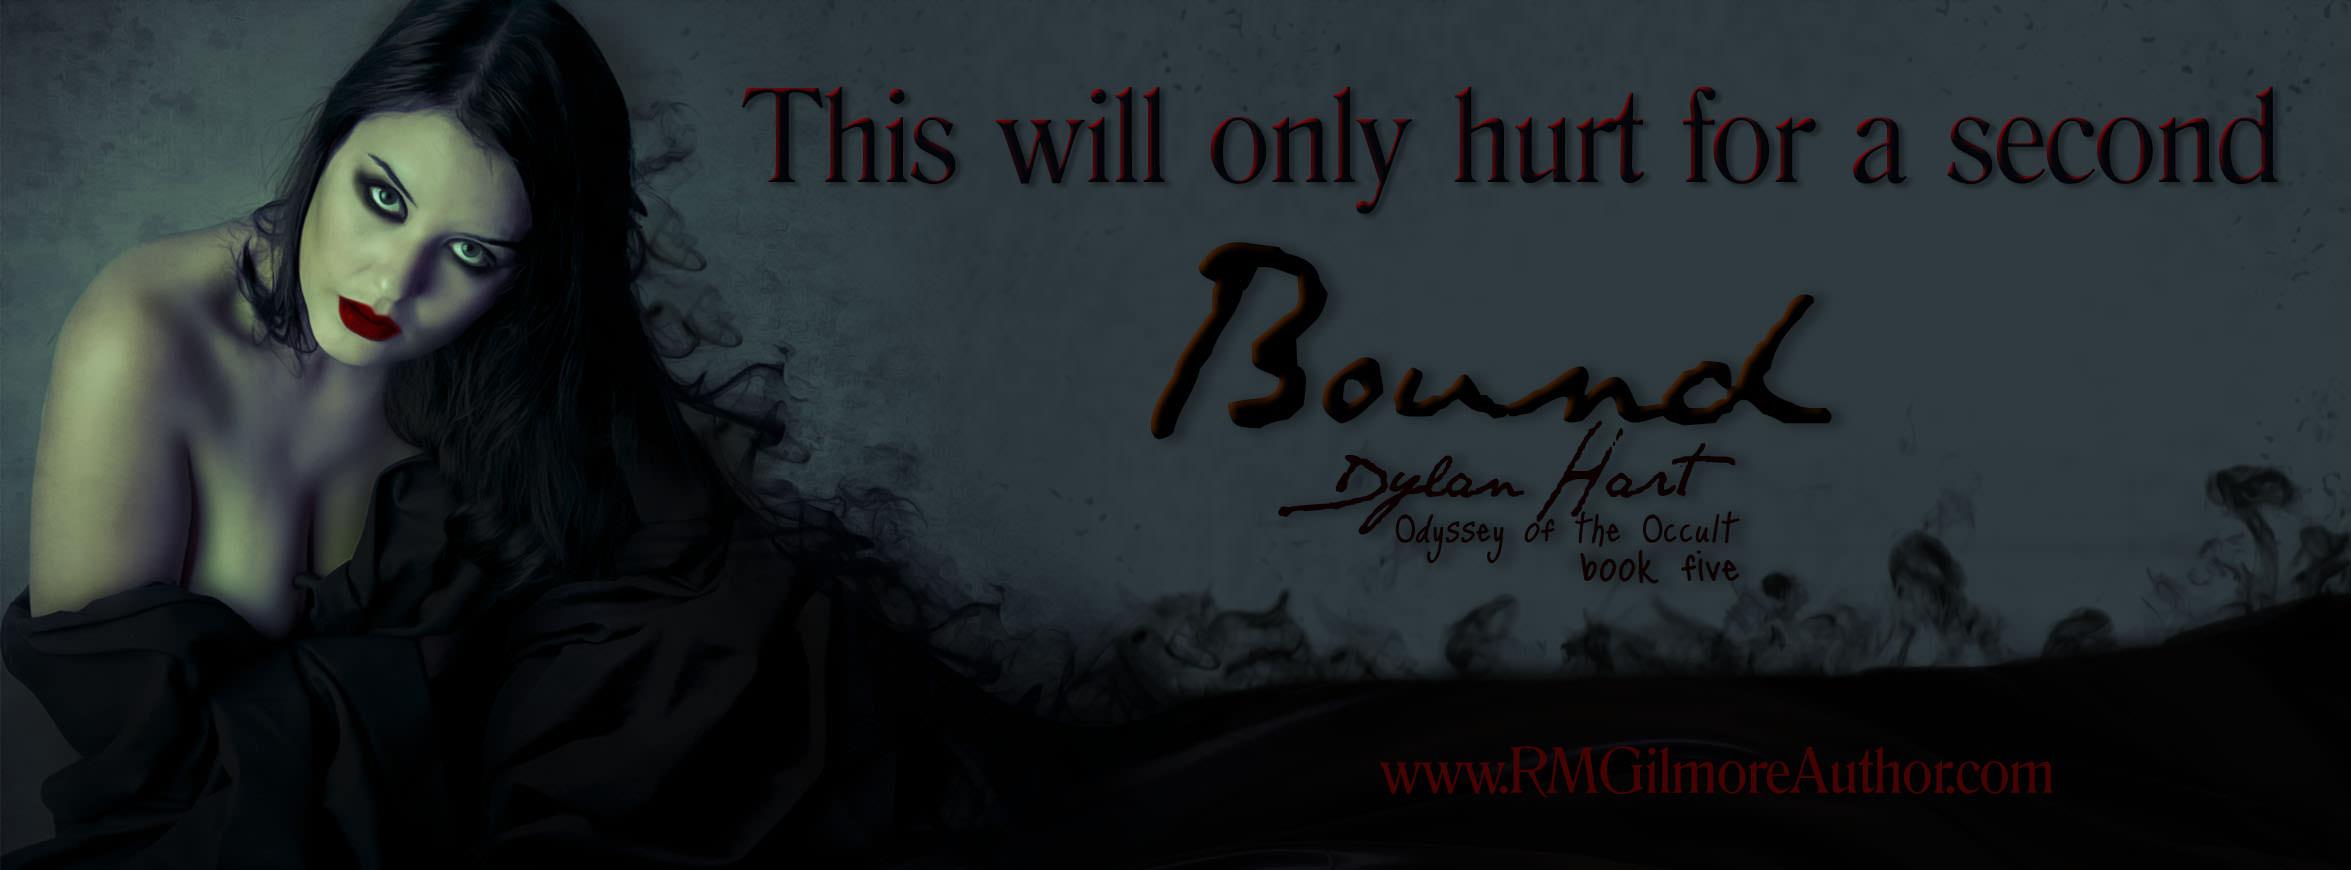 bound promo 2